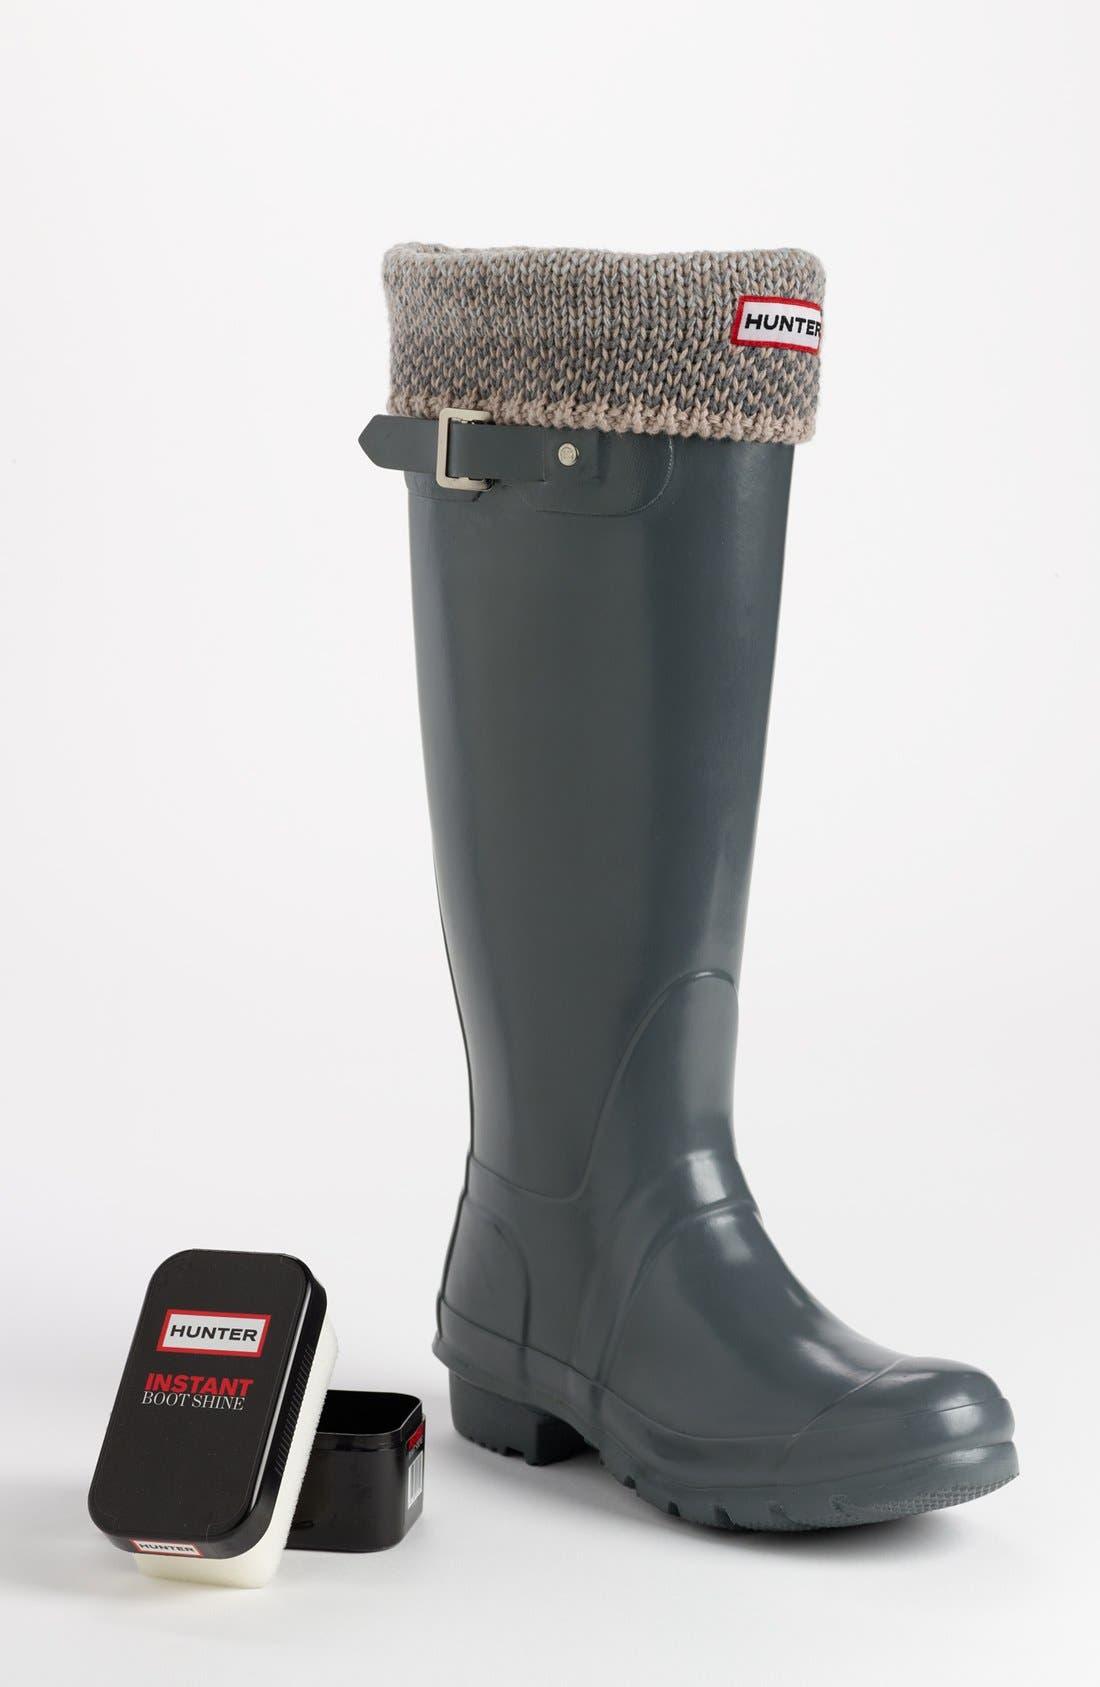 Main Image - Hunter 'Original Tall' Gloss Rain Boot, Welly Socks & Instant Boot Shine Sponge